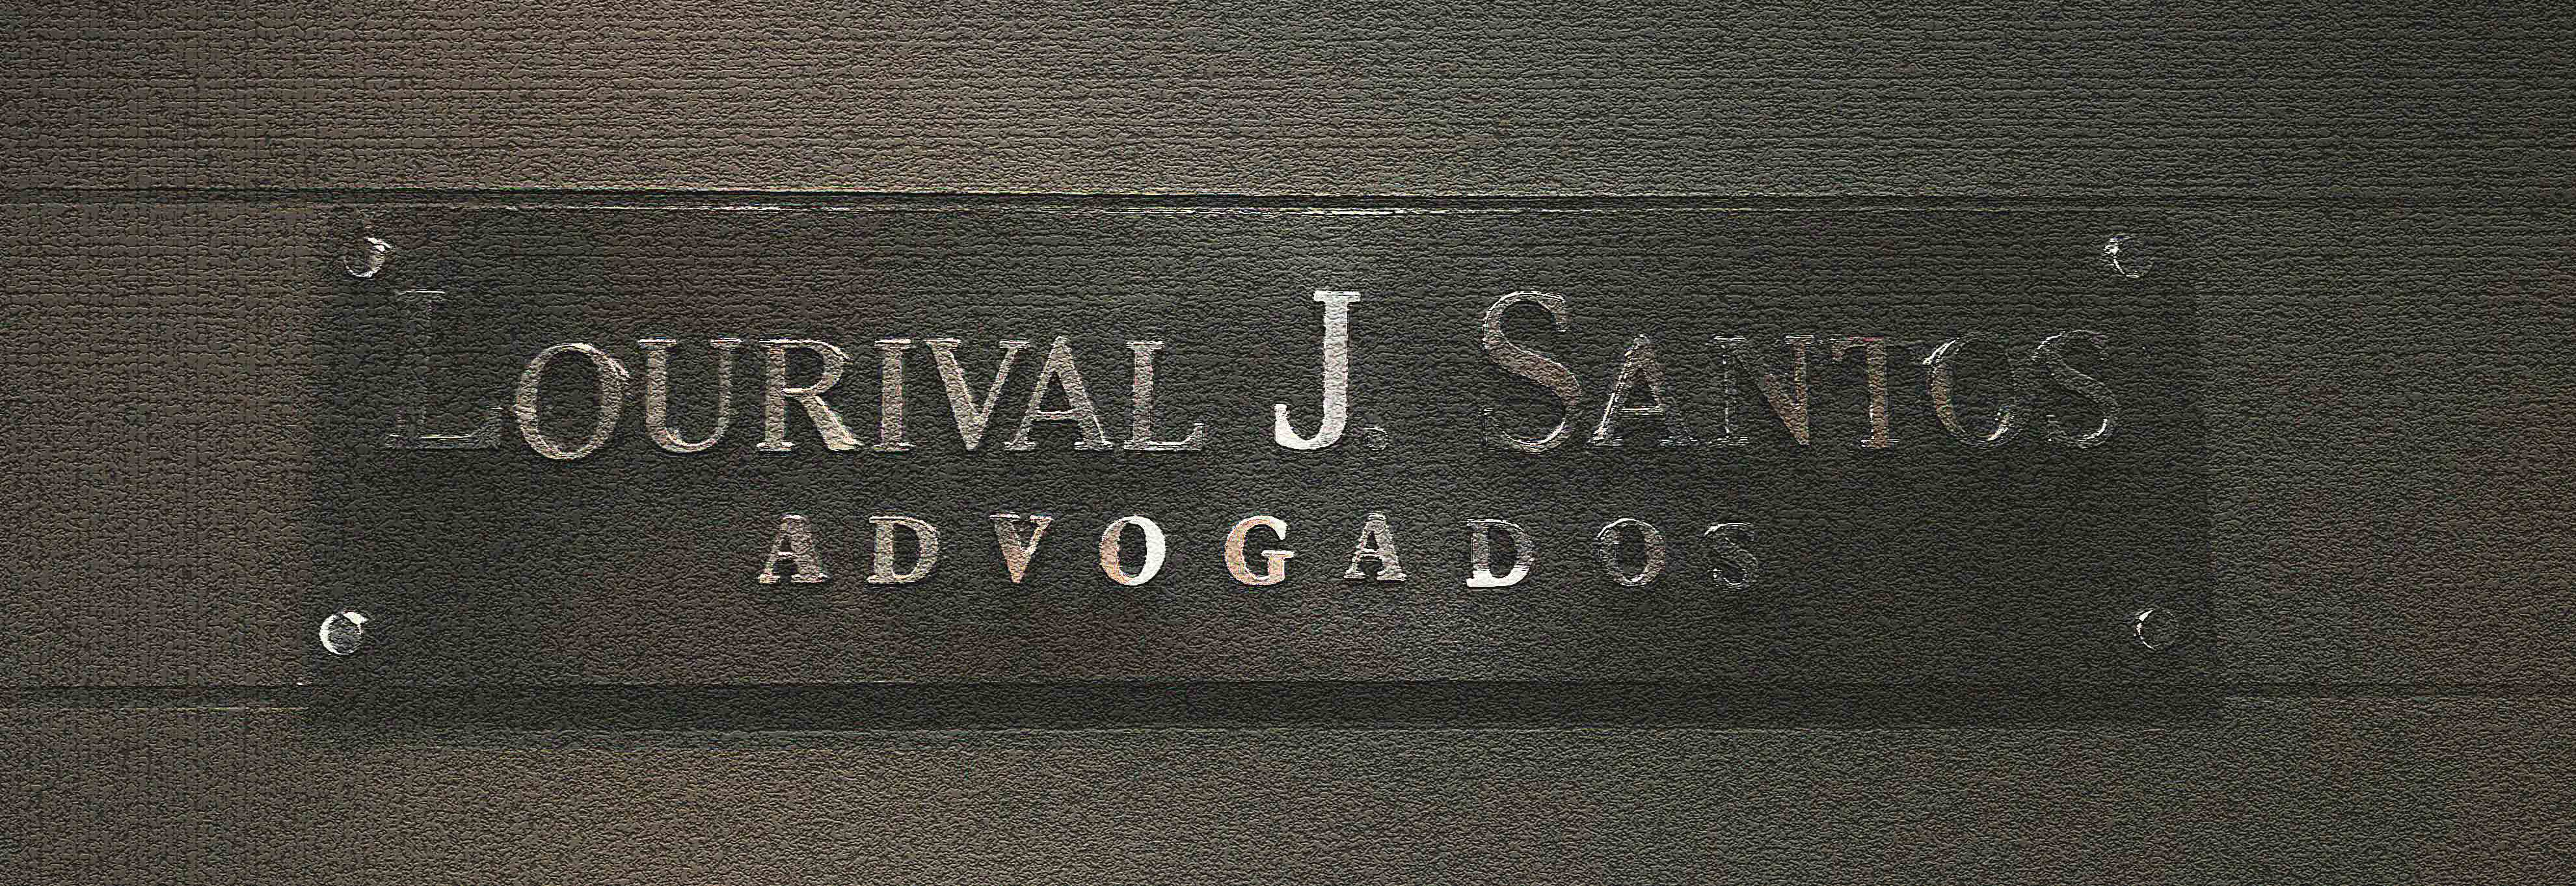 Slide Lourival J Santos